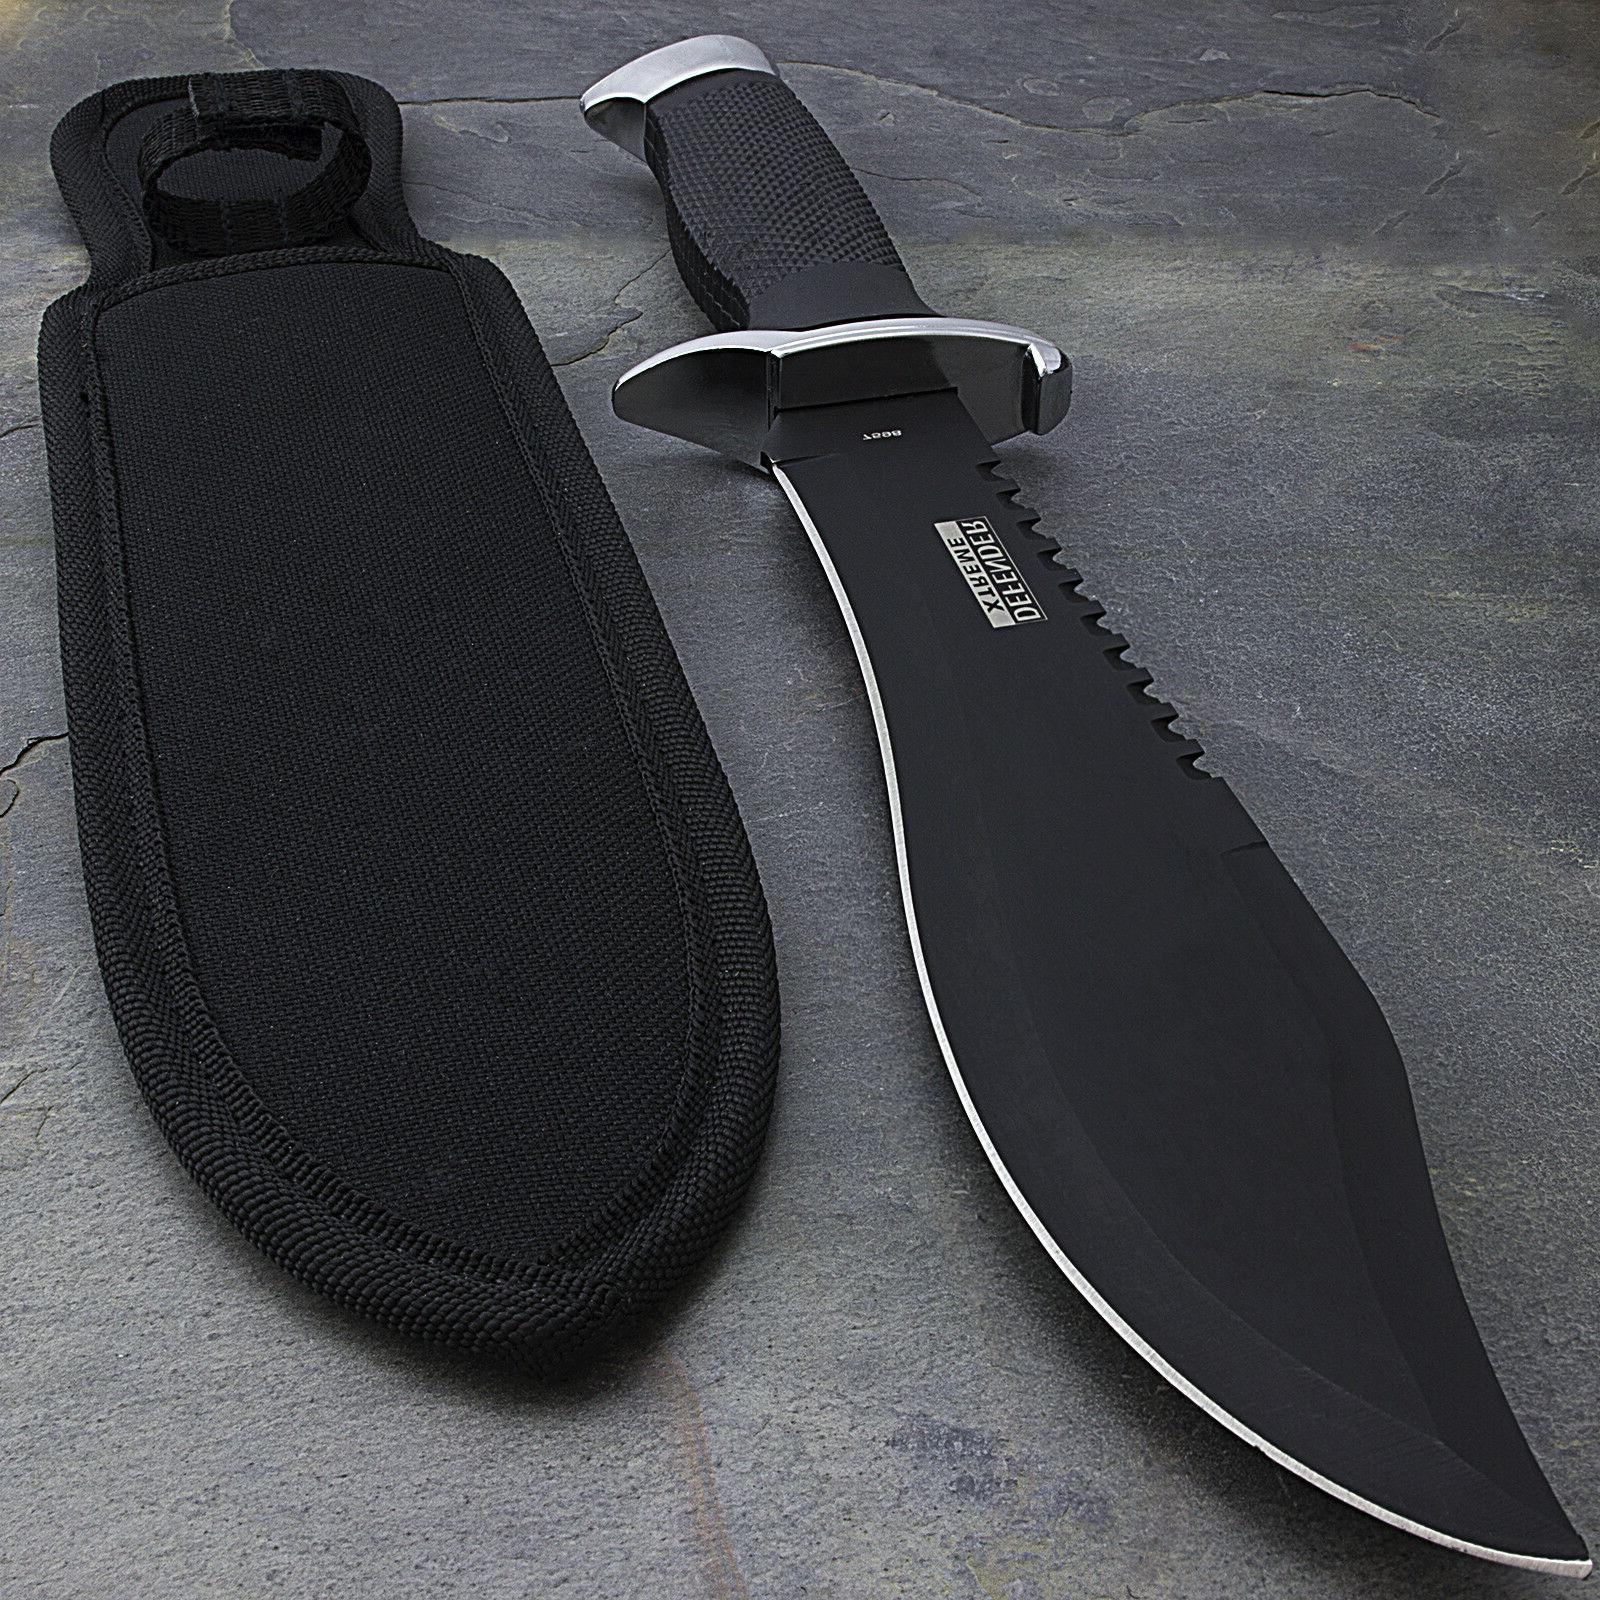 13 bowie survival hunting knife w sheath